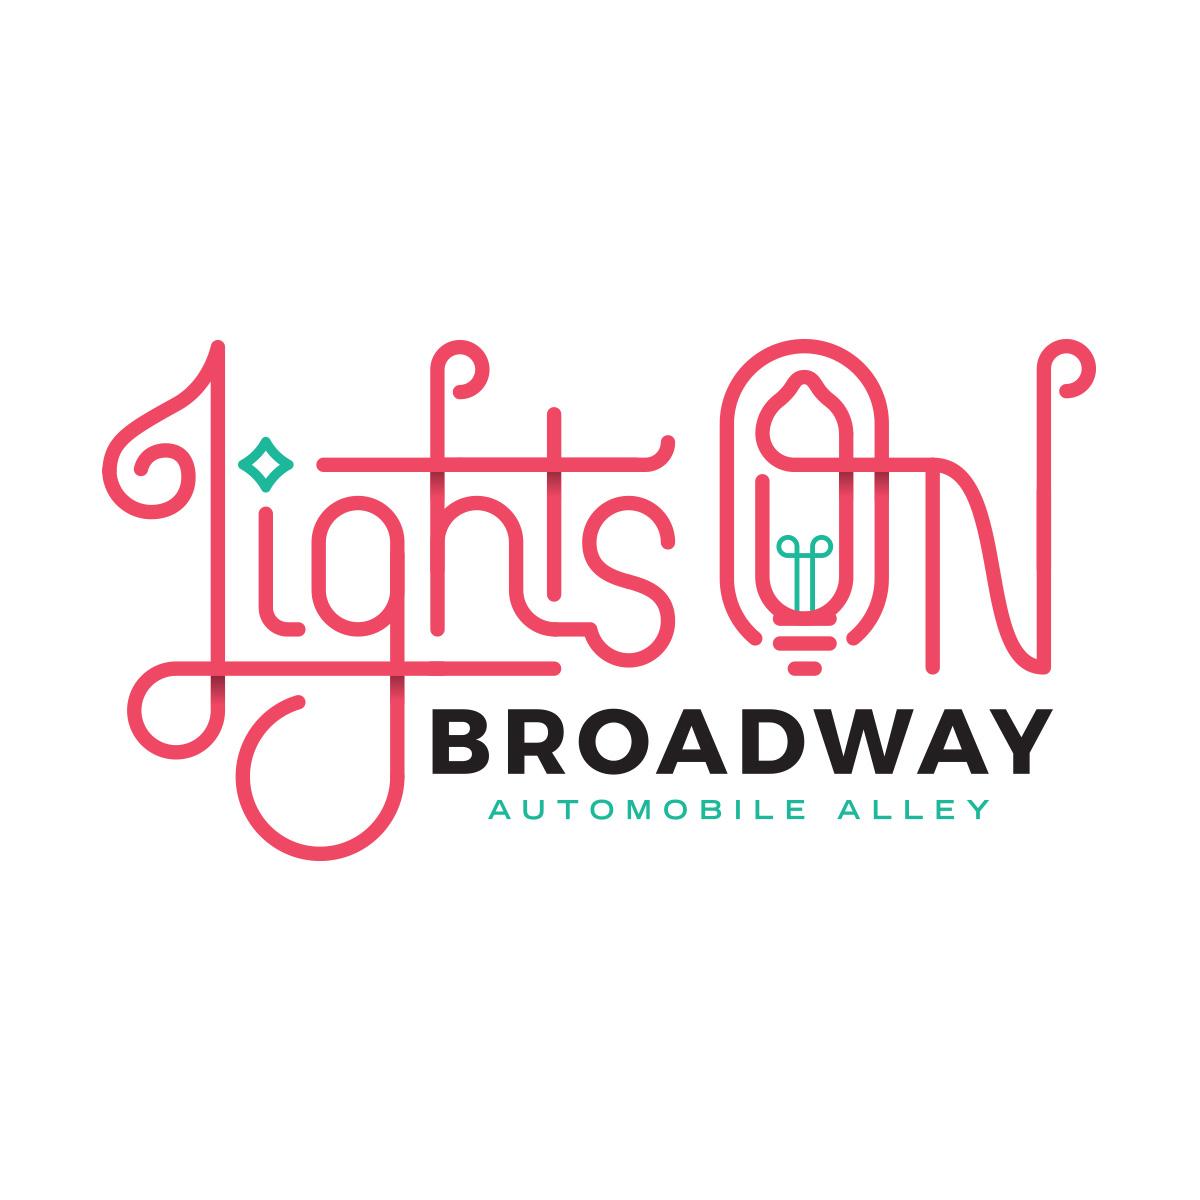 LightsOnBroadway_Logo.jpg